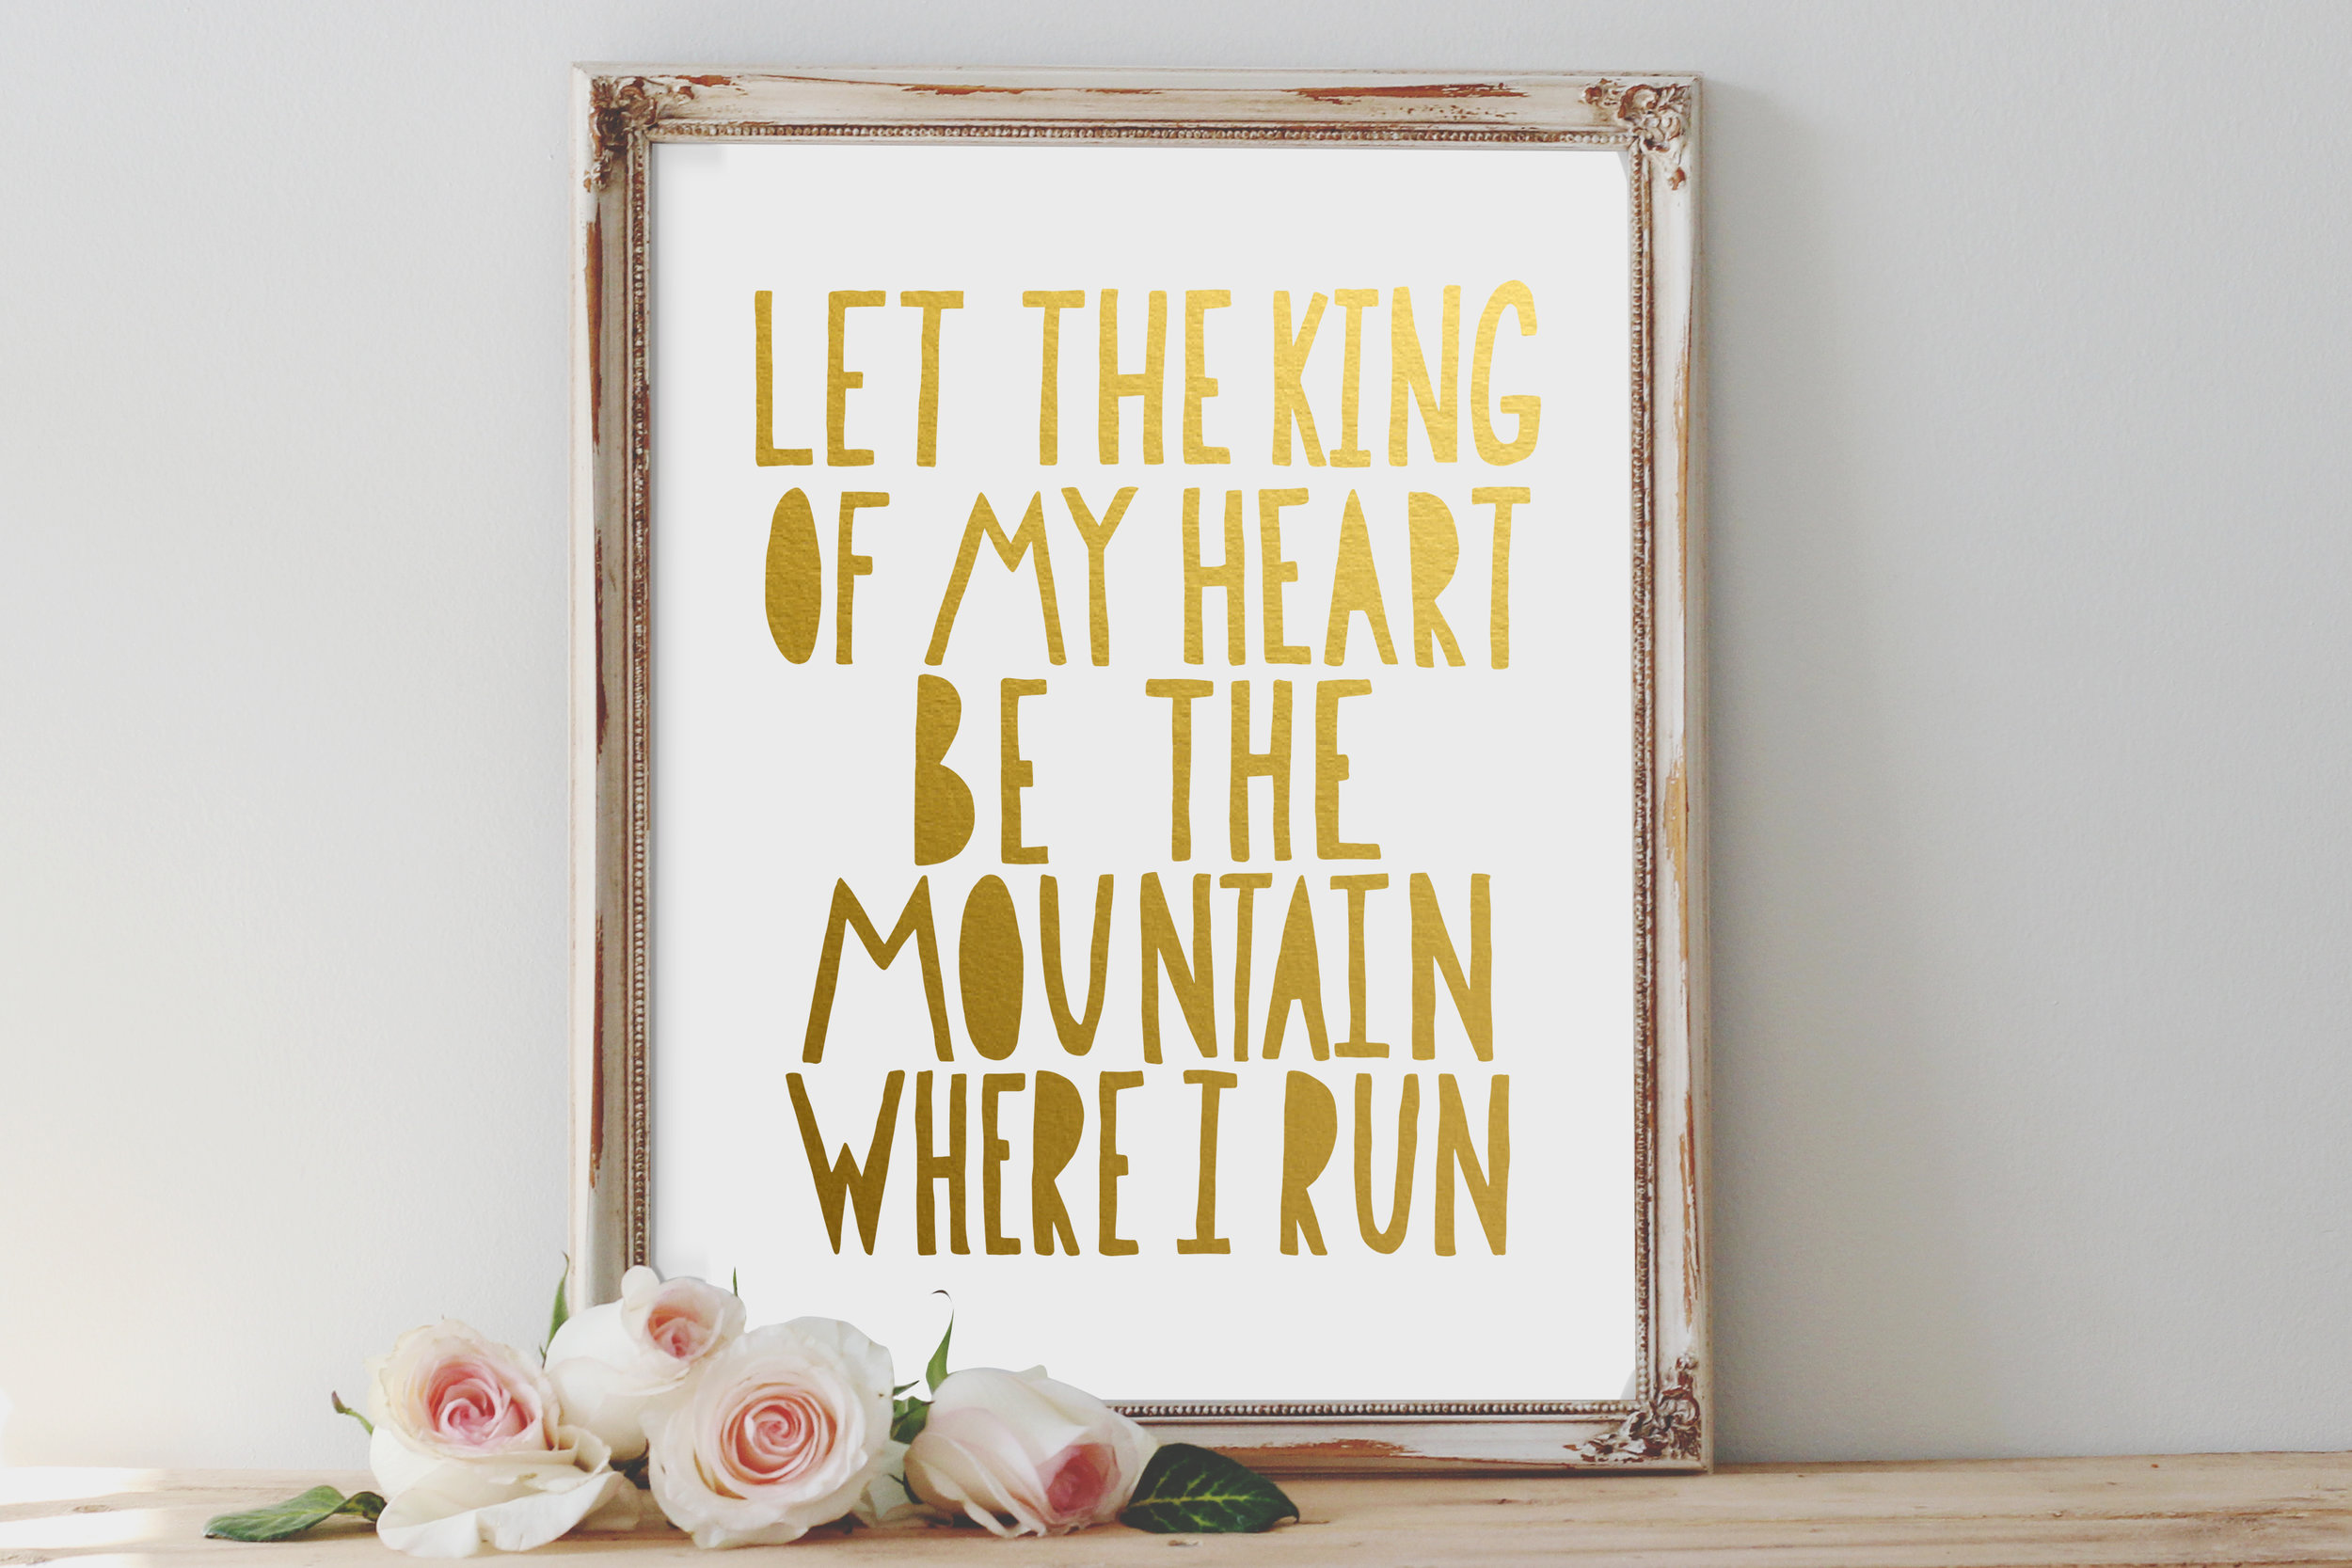 King_of_My_Heart.jpg